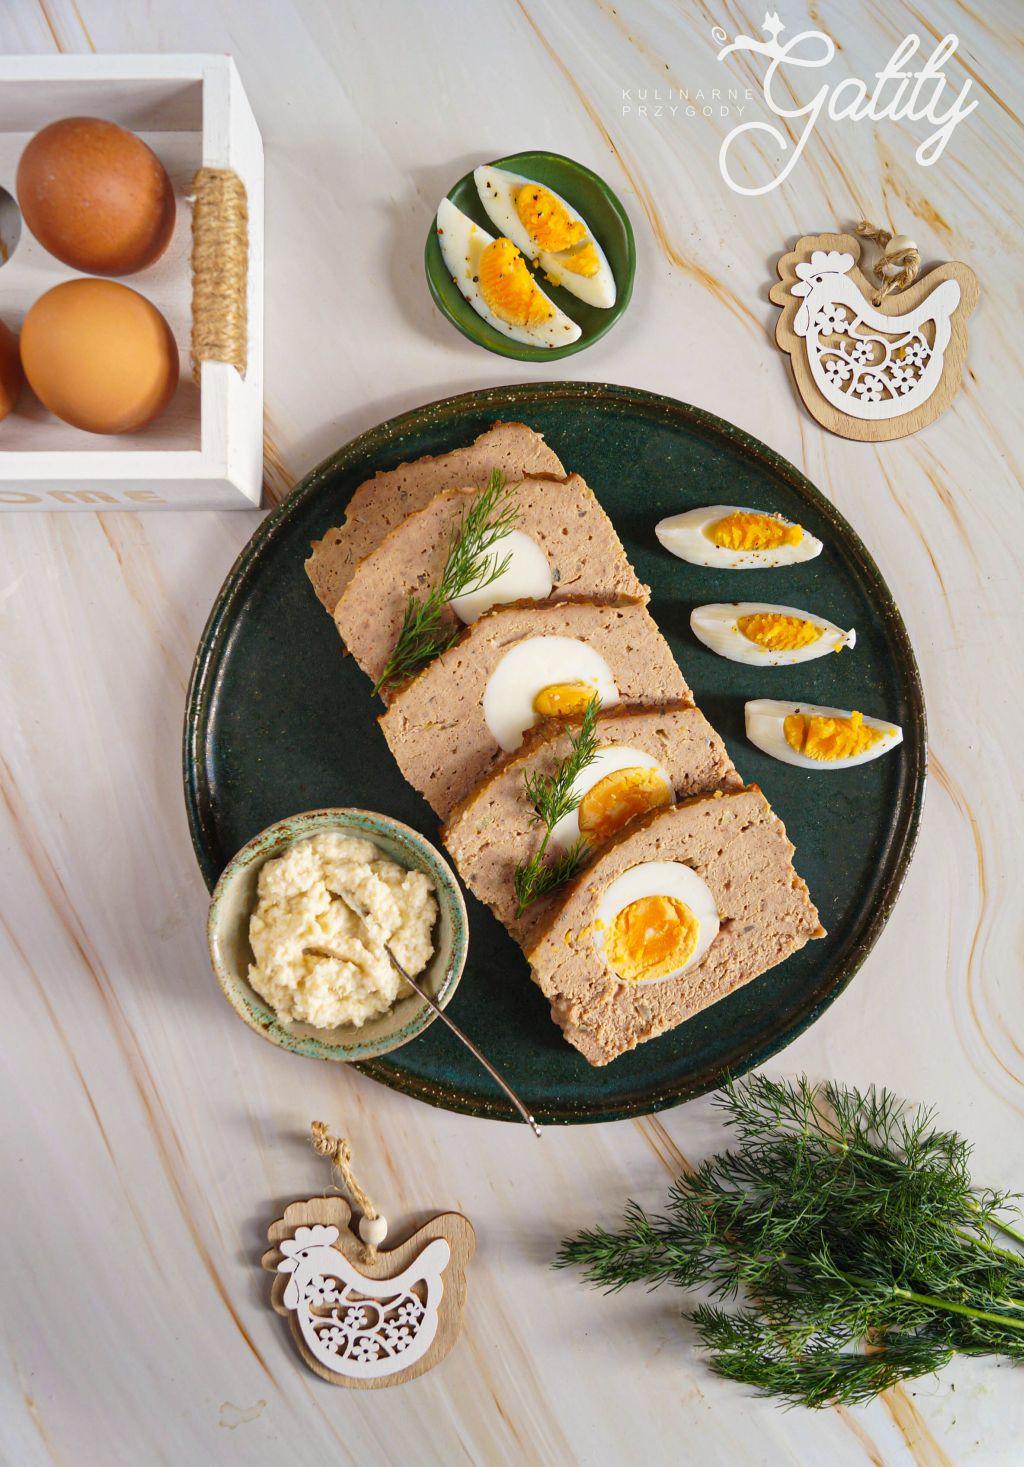 plastry-miesa-mielonego-z-jajkiem